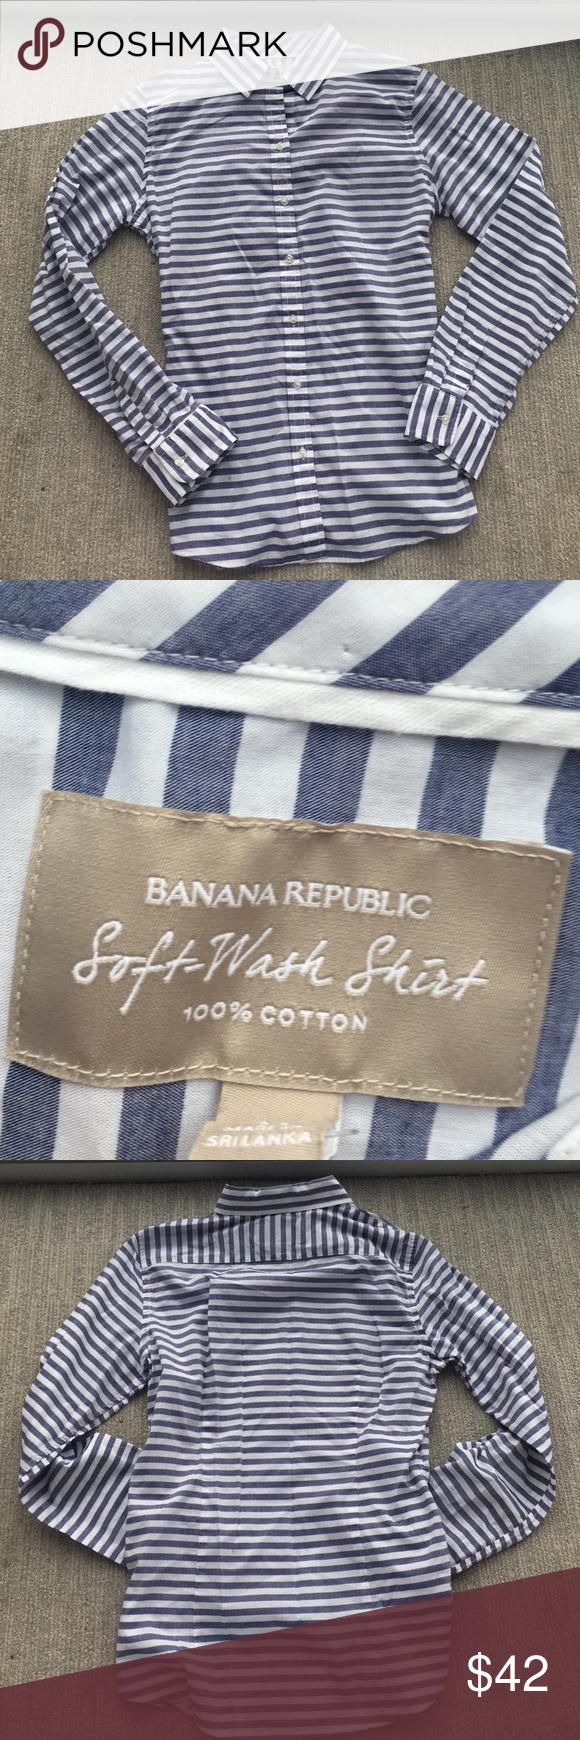 "Banana Republic Striped Button Down Banana Republic Striped Button Down; Blue and White; Front Button Closure; Button Closure at Cuffs; 100% Cotton; Machine Wash; Approx. Measurements: Length: 27"", Bust: 20""; Excellent Condition Banana Republic Tops Button Down Shirts"